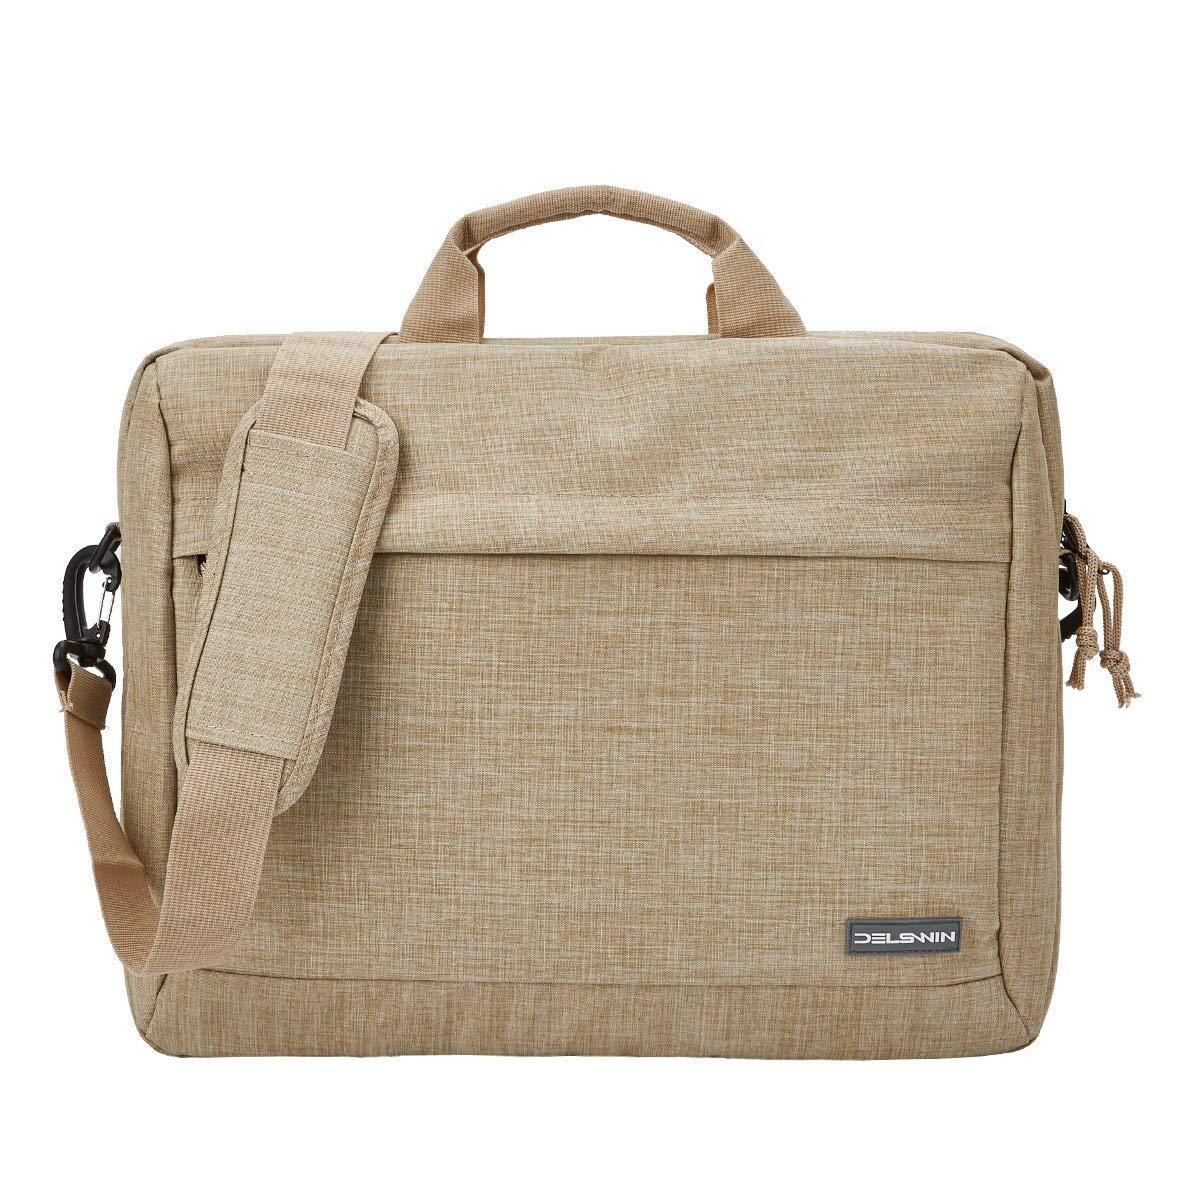 DELSWIN 15.6 Inches Laptop Briefcase Sleeve - Lightweight Laptop Shoulder Messenger Bag Business Carrying Handbag for School/Travel/Women/Men (15.6, Beige)